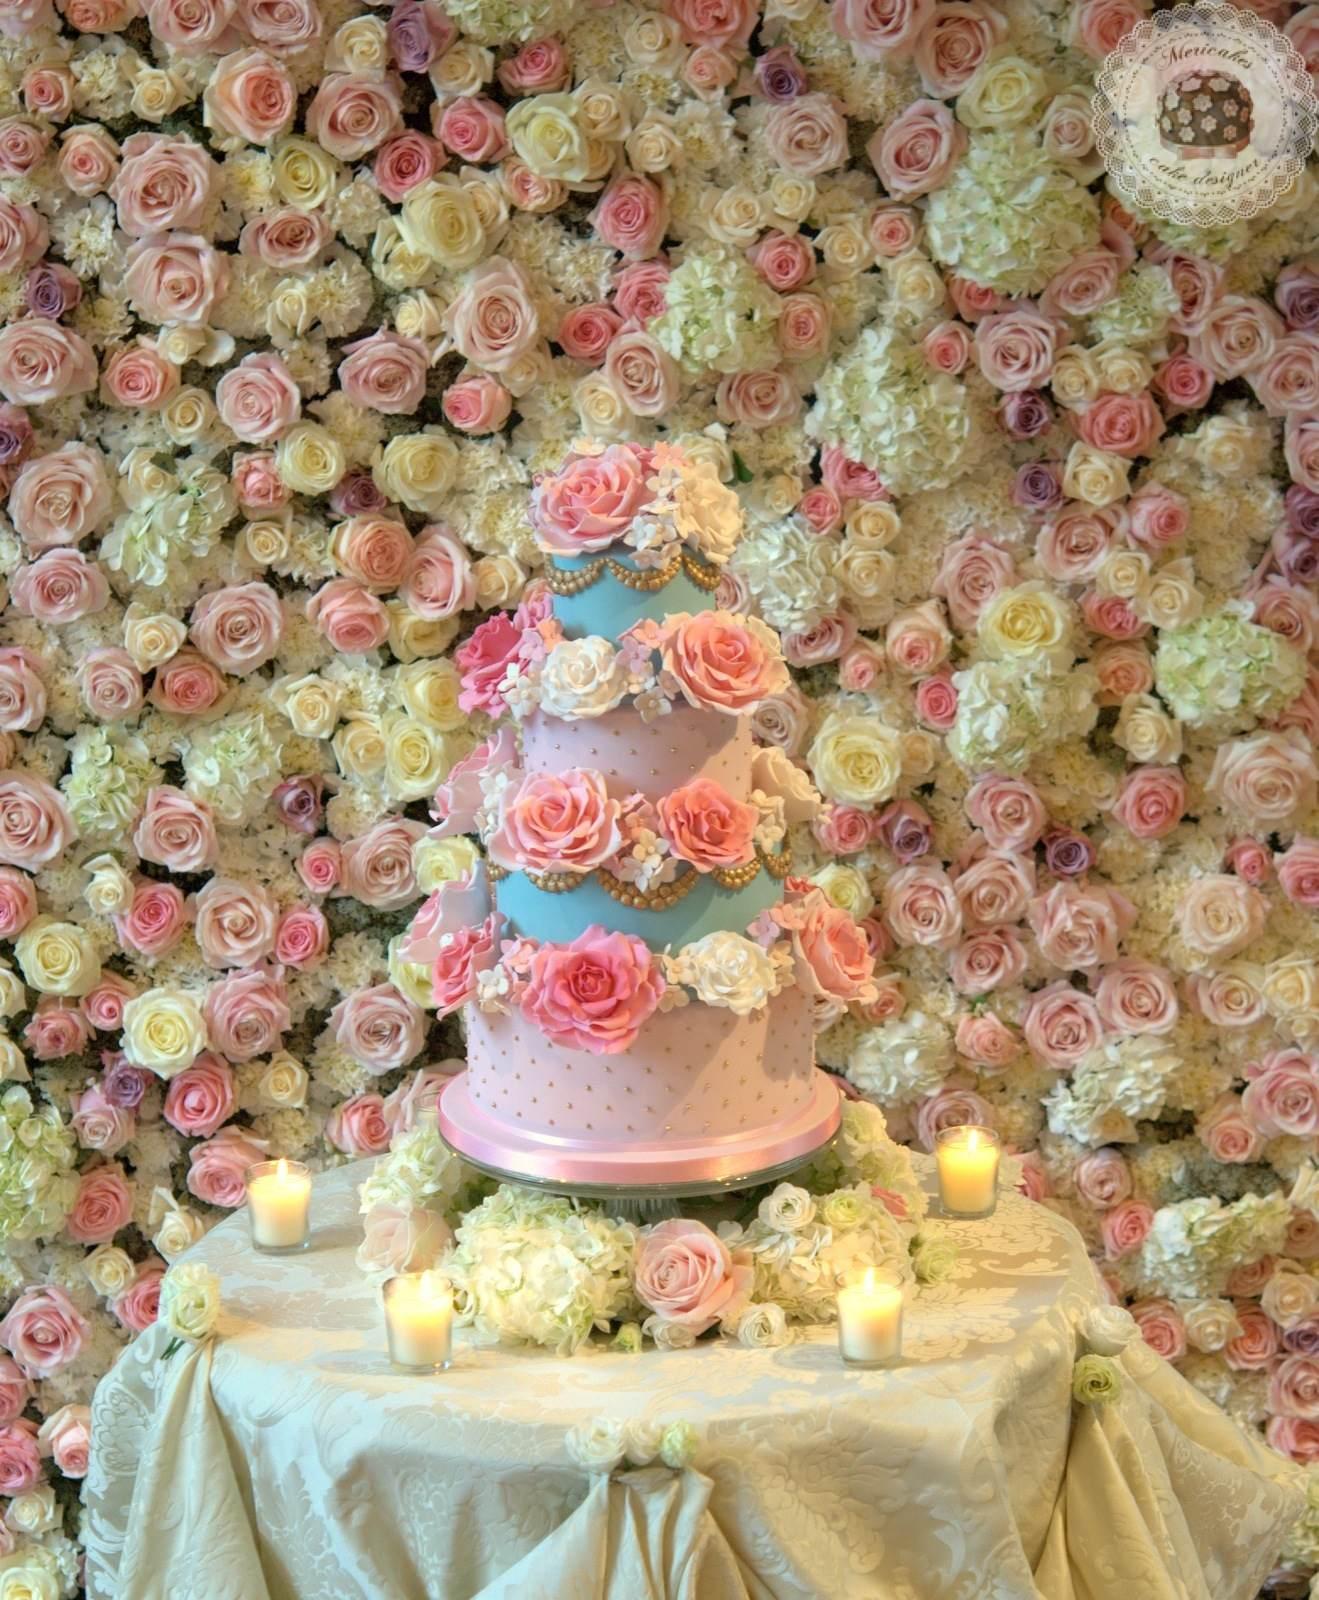 avalanche-roses-wedding-cake-tarta-de-boda-bodas-barcelona-mericakes-fondant-barcelona-wedding-bridal-rosas-11